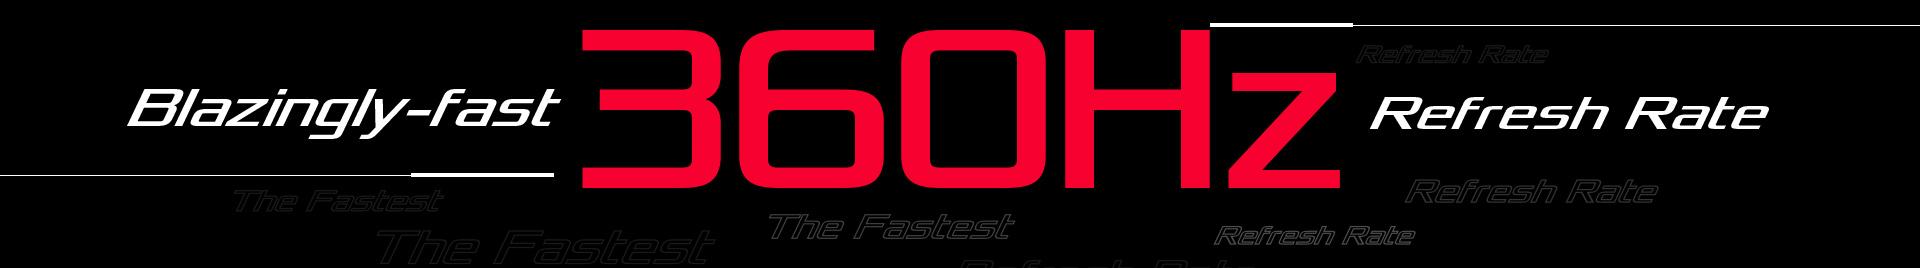 Blazingly-fast 360Hz Refresh Rate